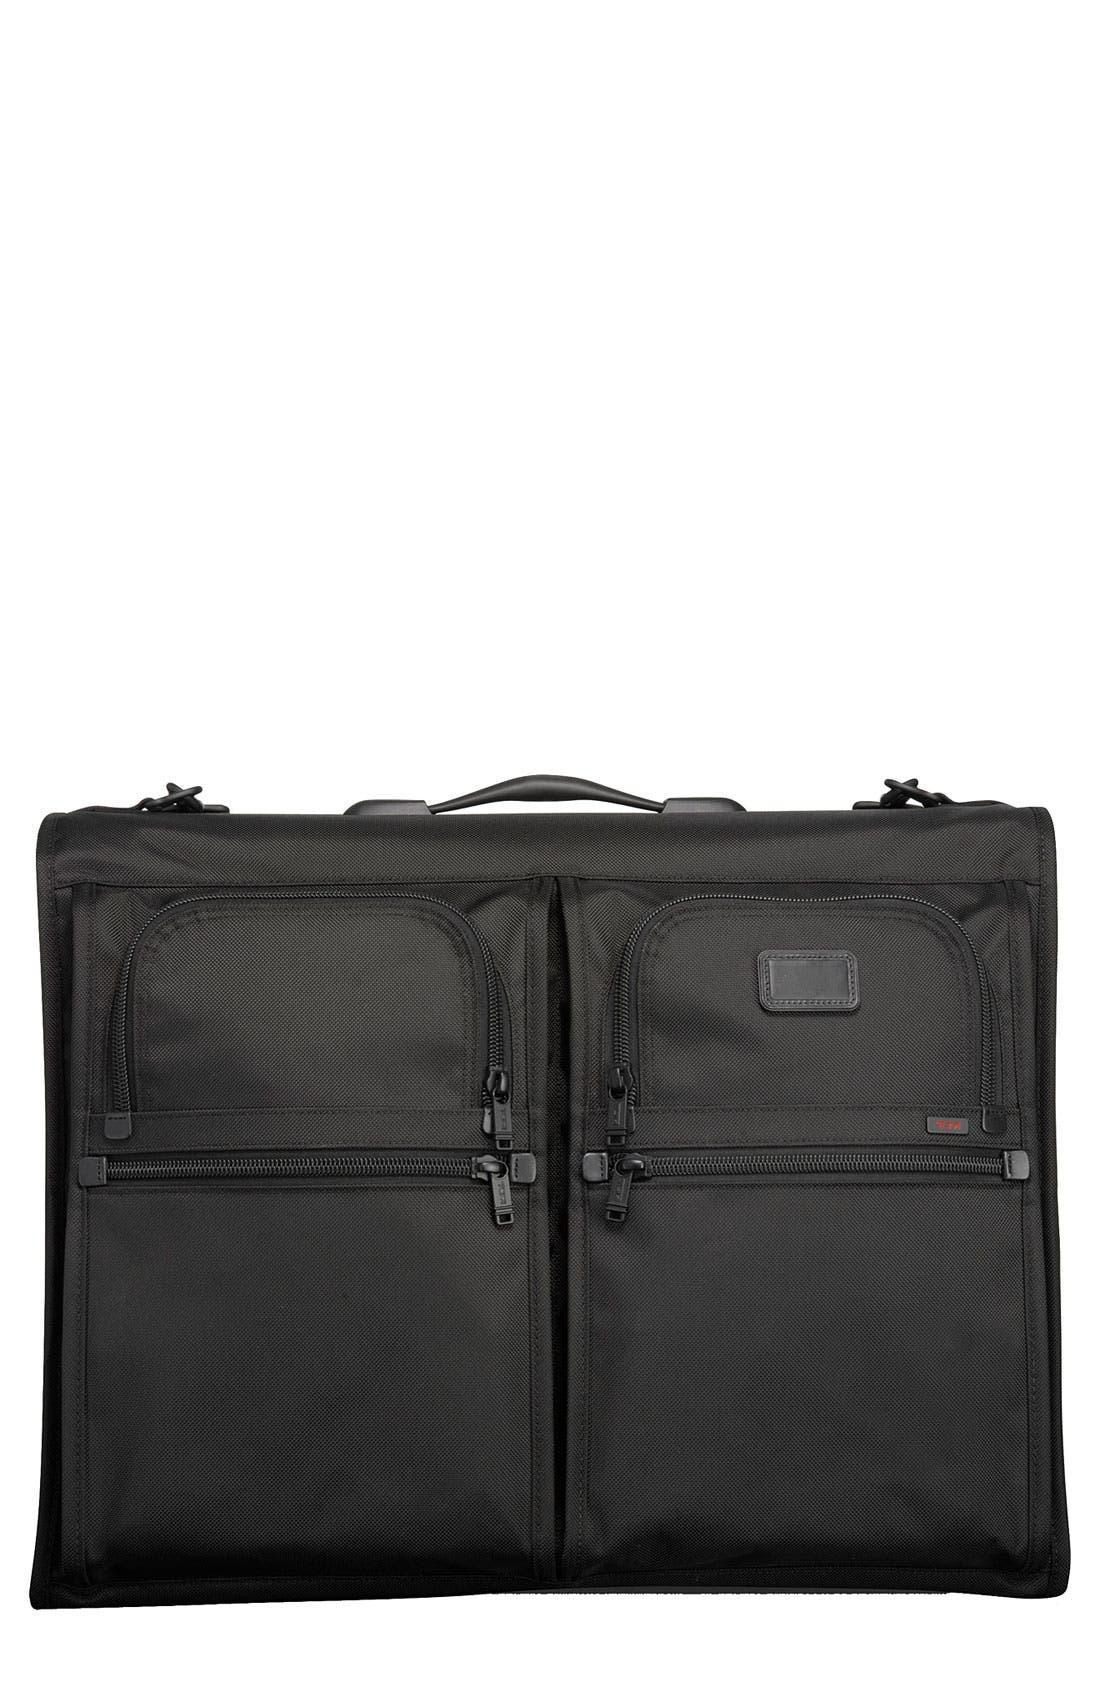 Main Image - Tumi 'Alpha' Classic Garment Bag